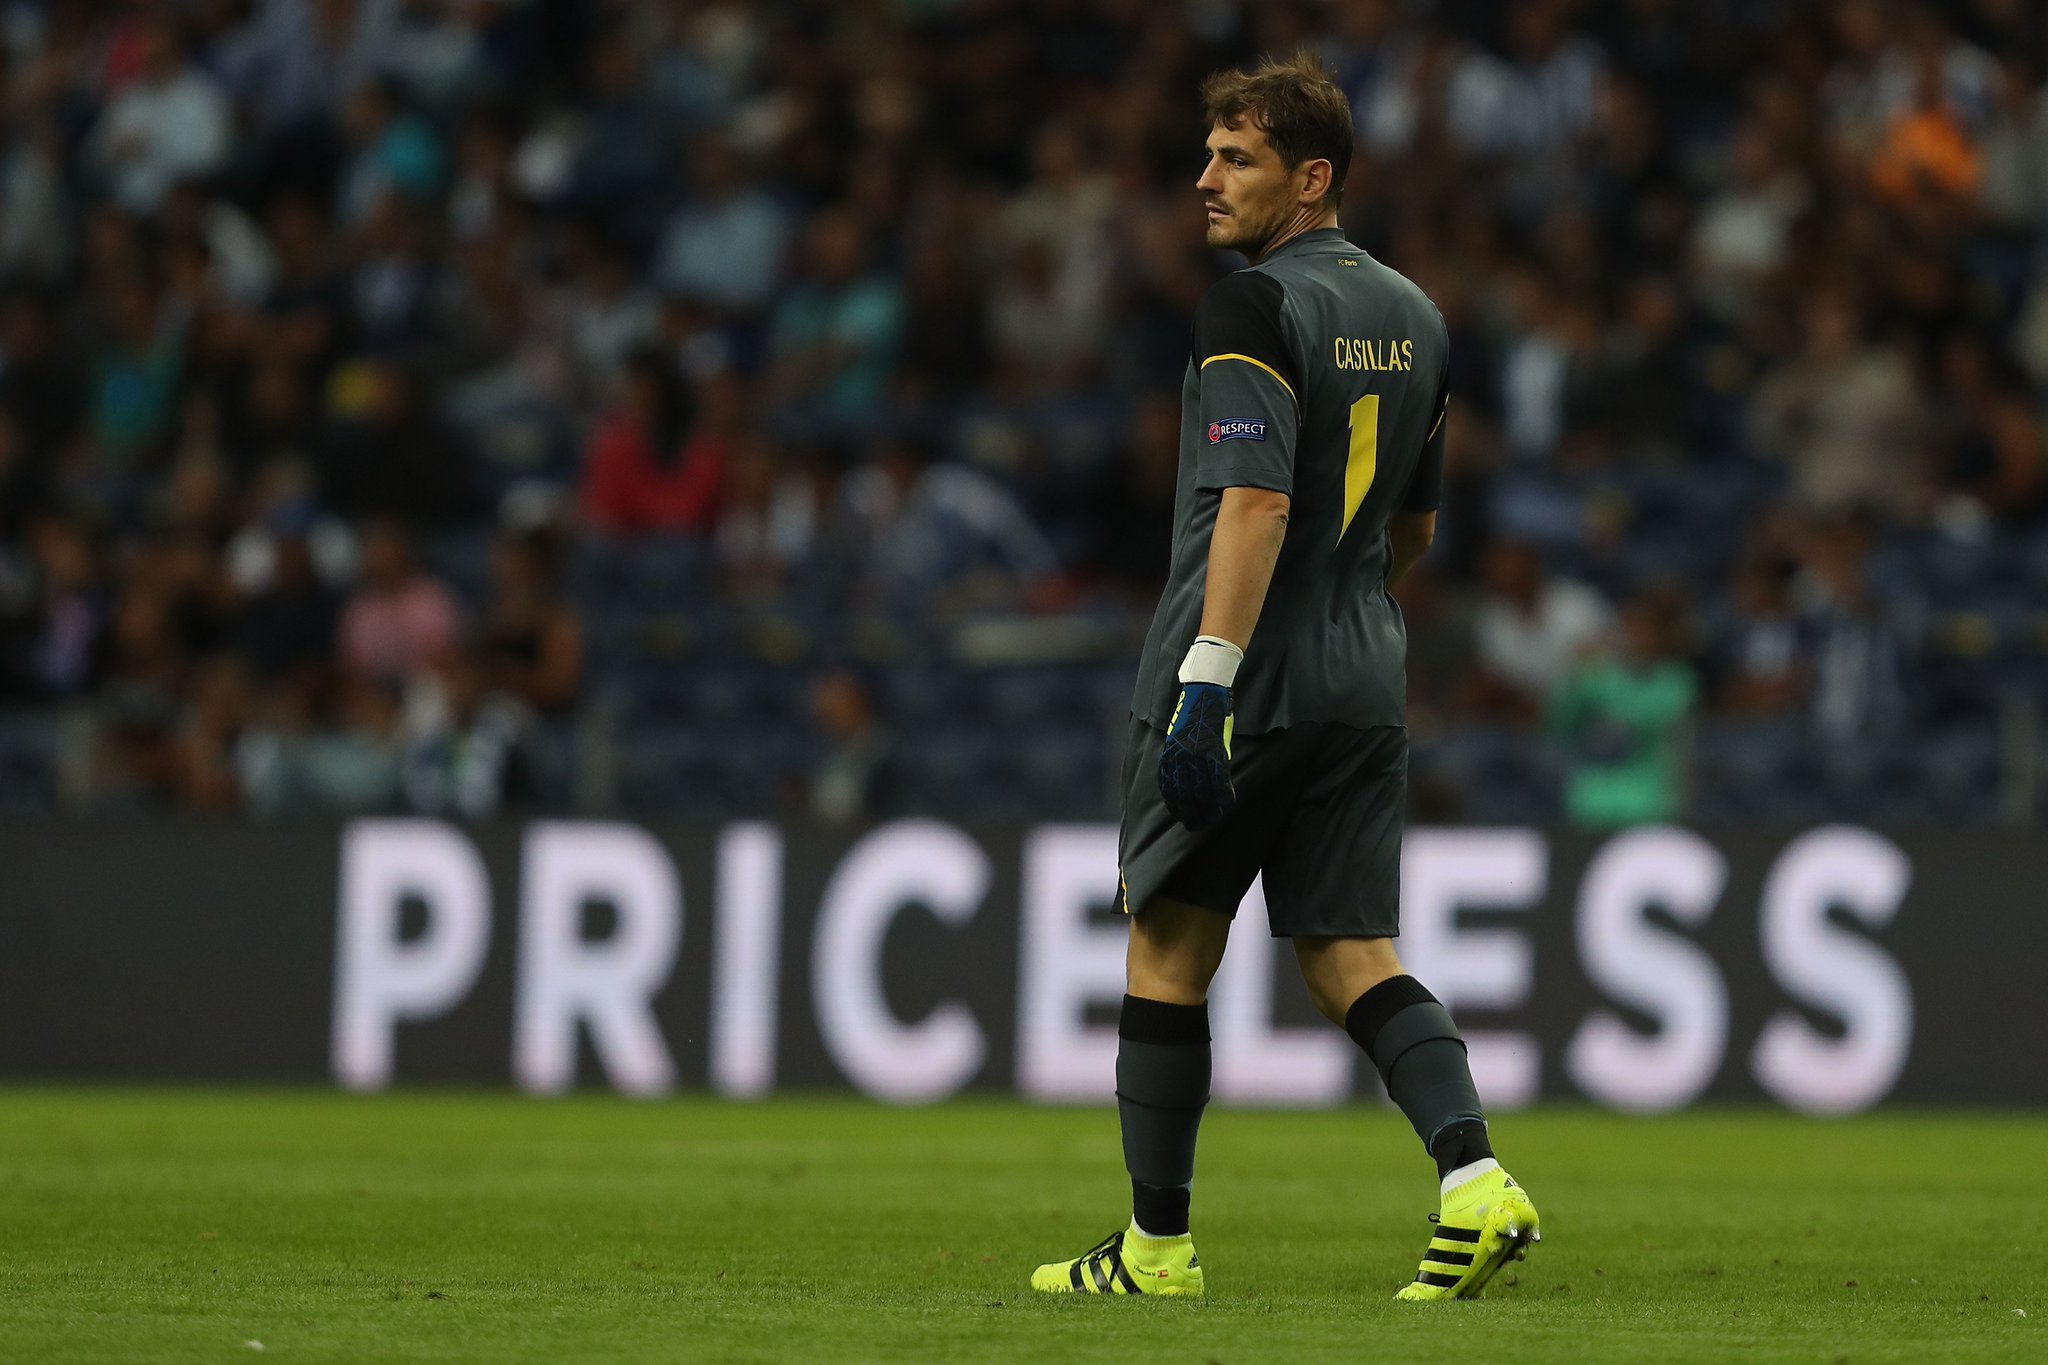 Three-time winner Iker Casillas set for his 20th season in the #UCL ������ https://t.co/xZ8WmM8jLa